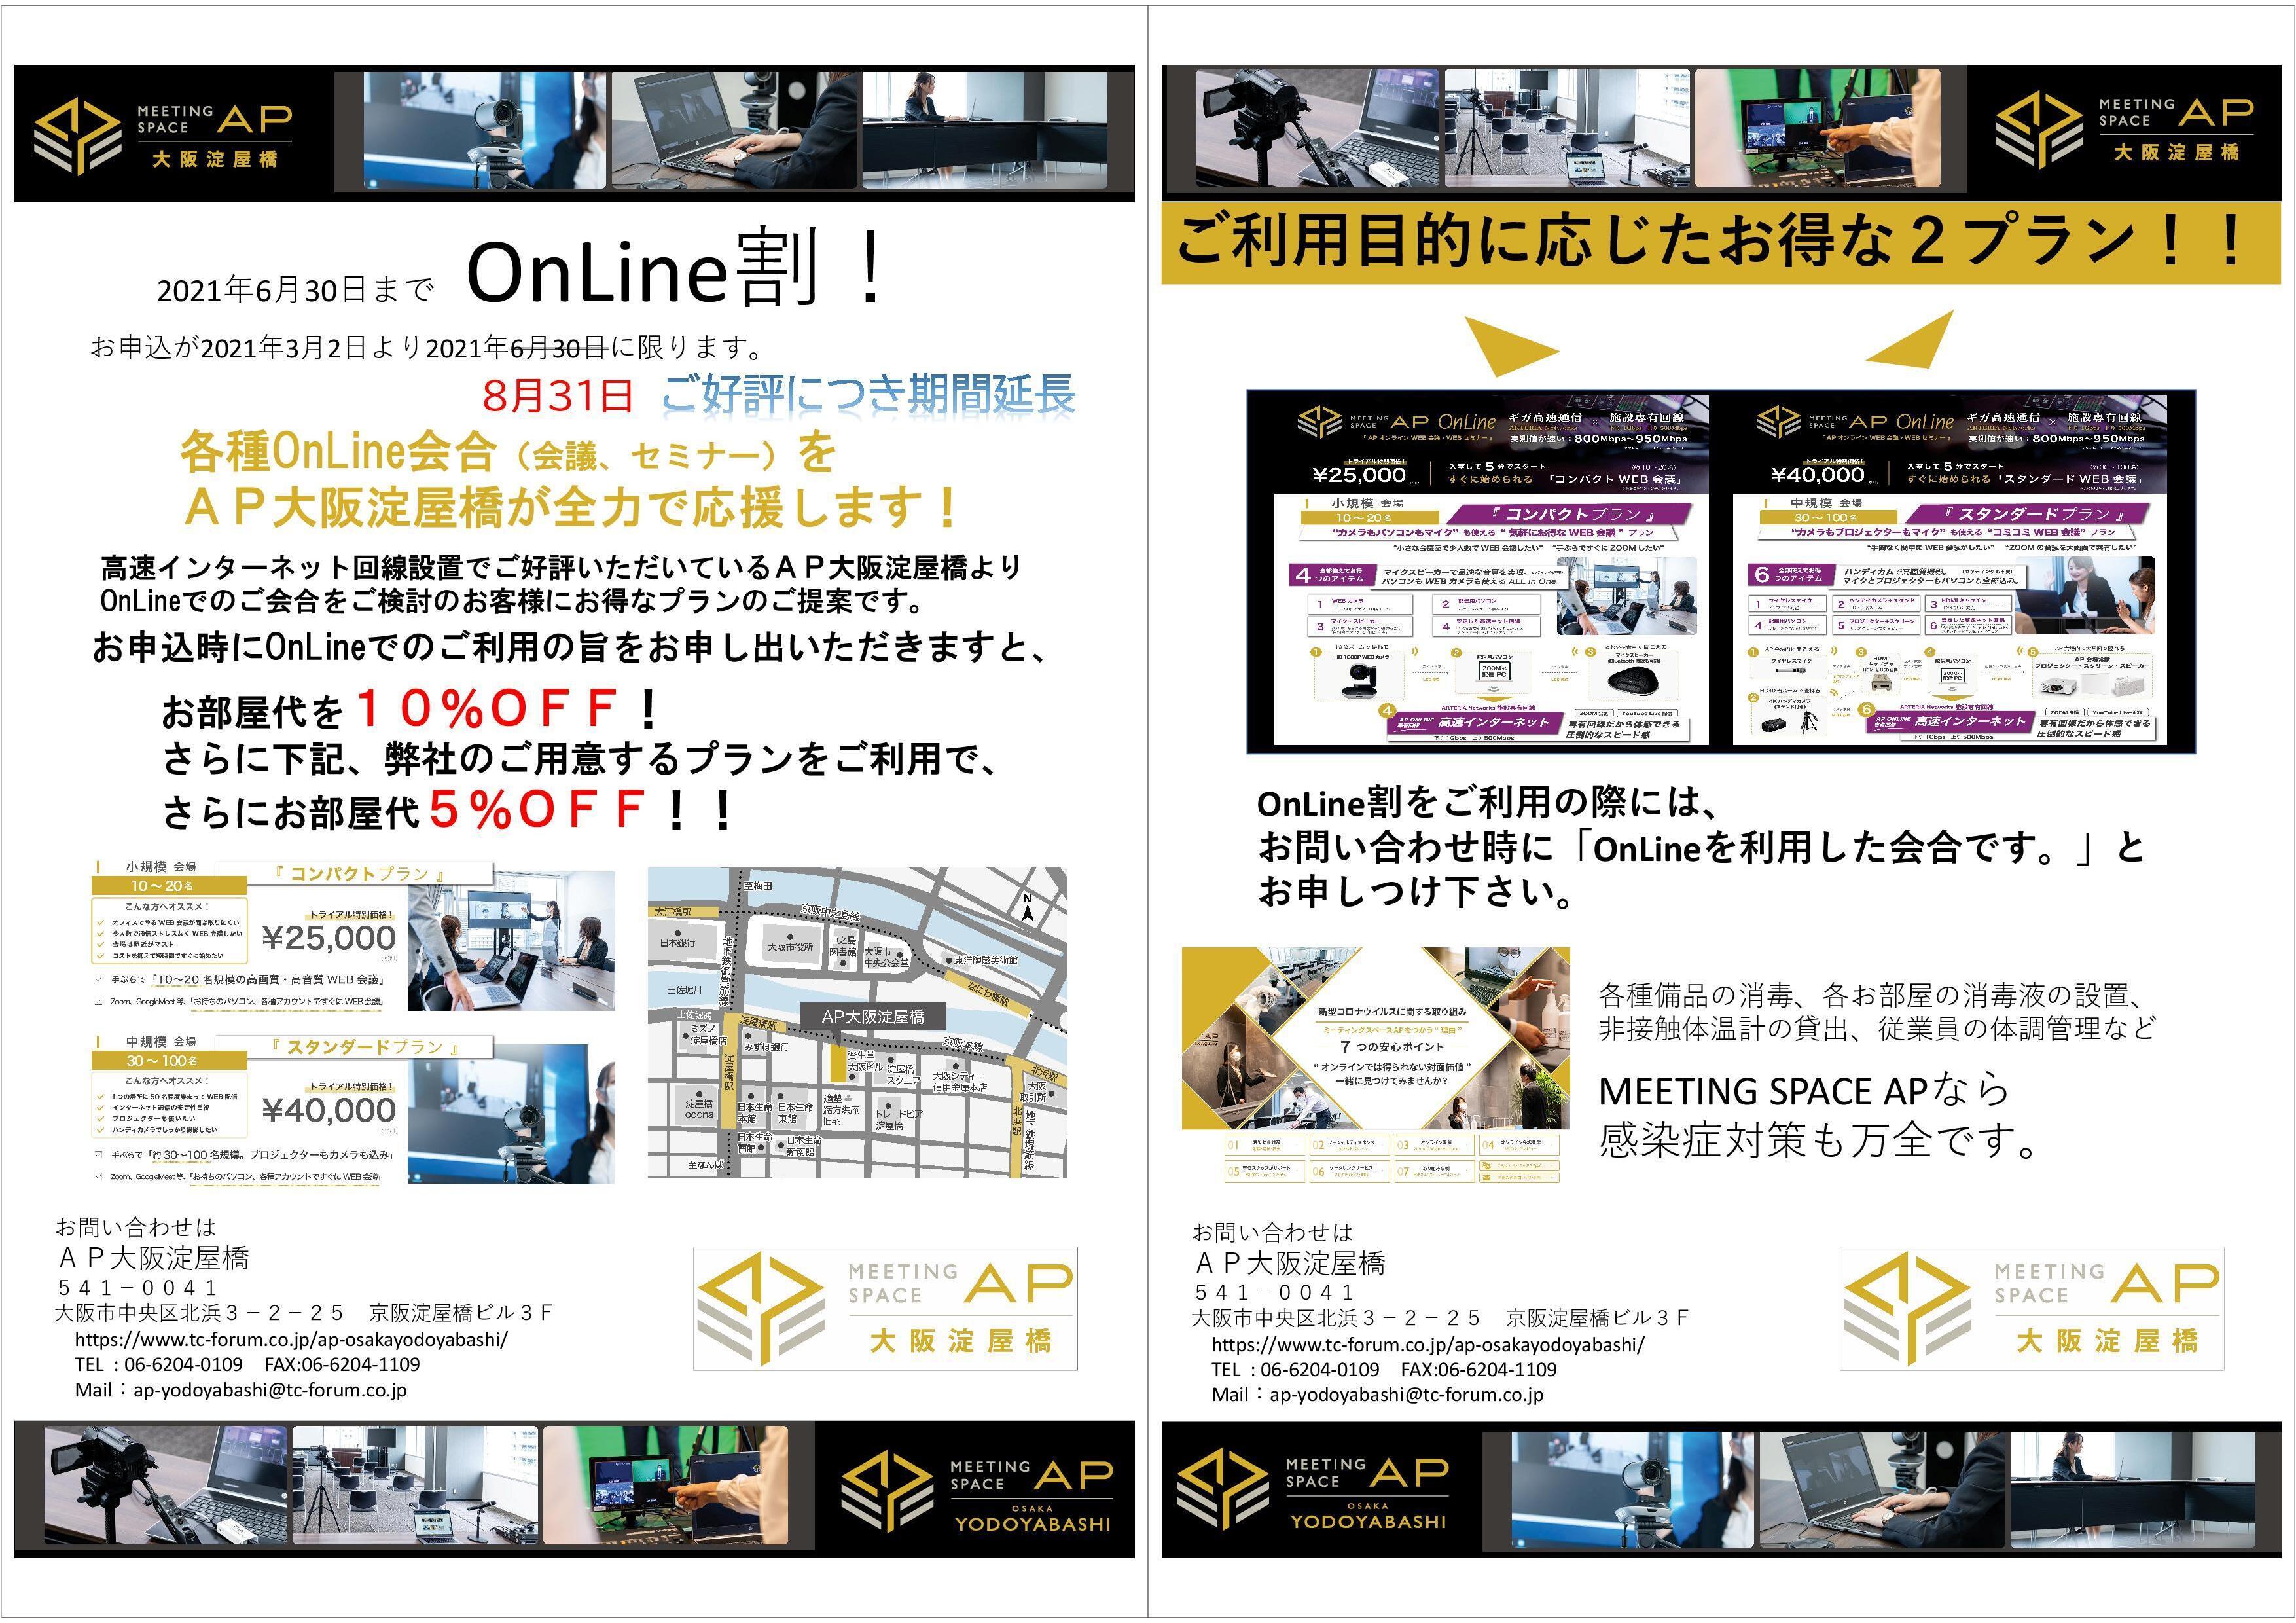 OnLine割チラシ(期間延長Ver).jpg